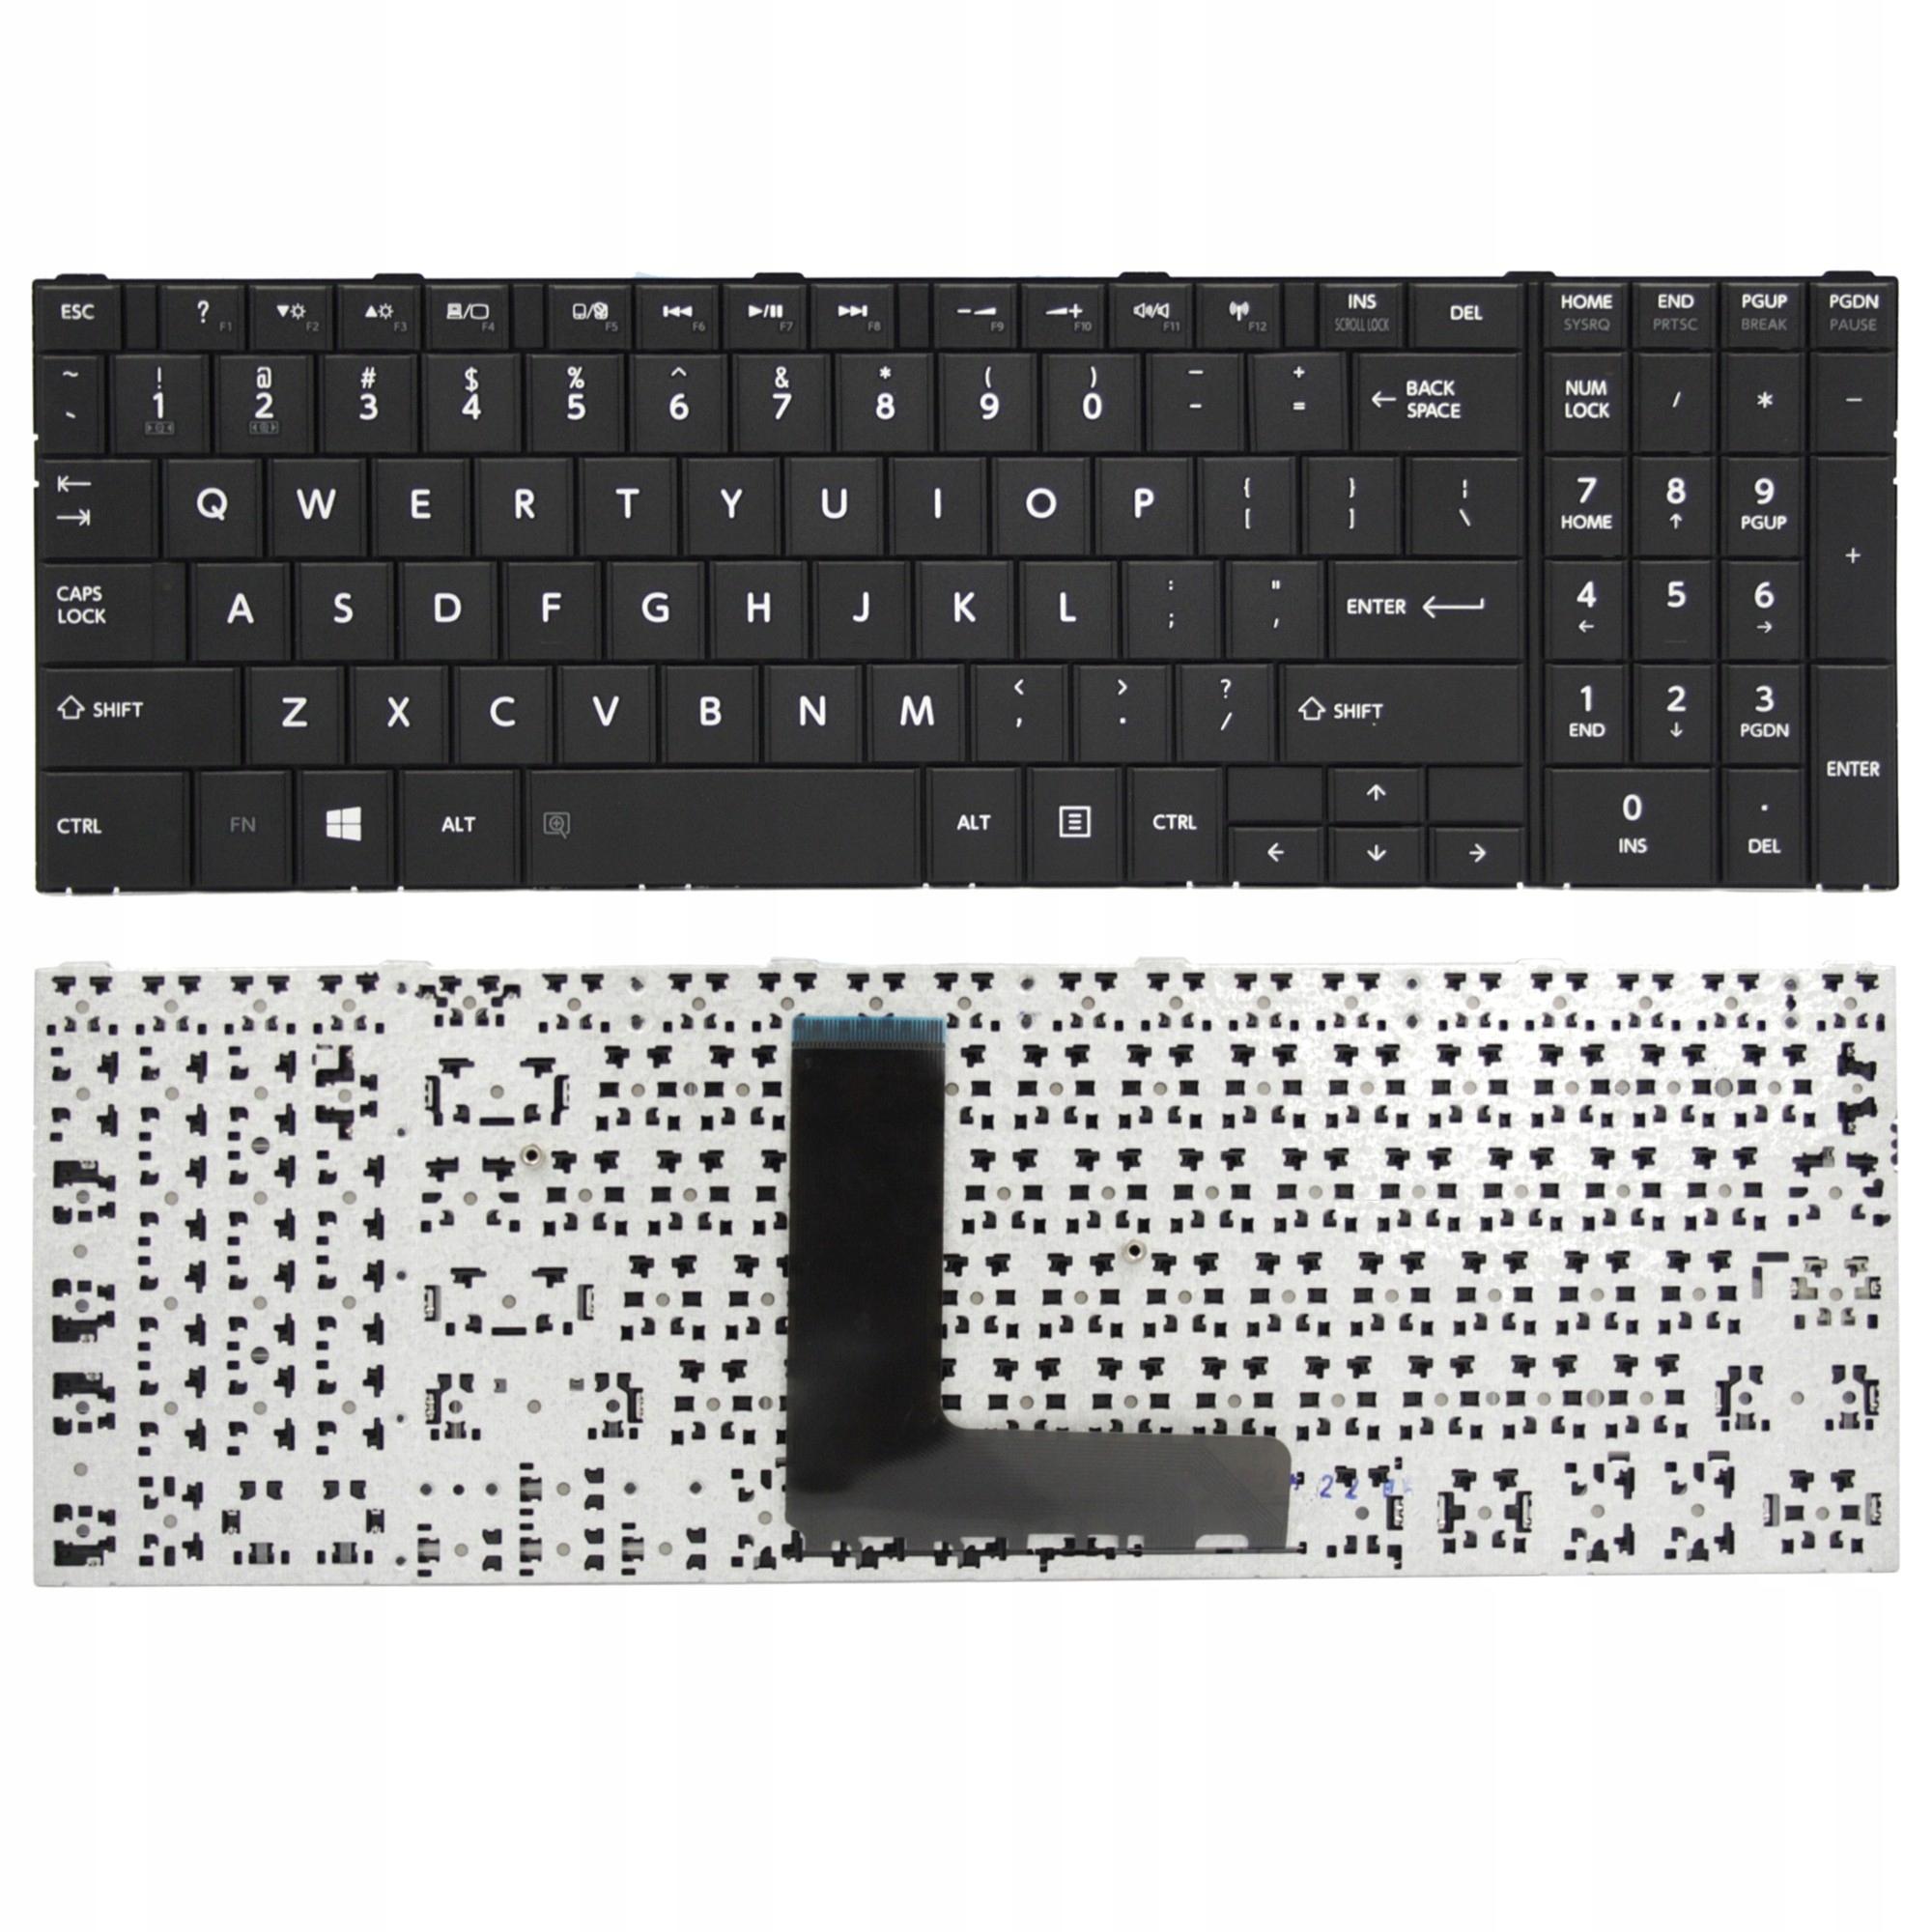 KLAWIATURA TOSHIBA C50-B-14D C50-B-14E C50-B-10P - Klawiatury do laptopów